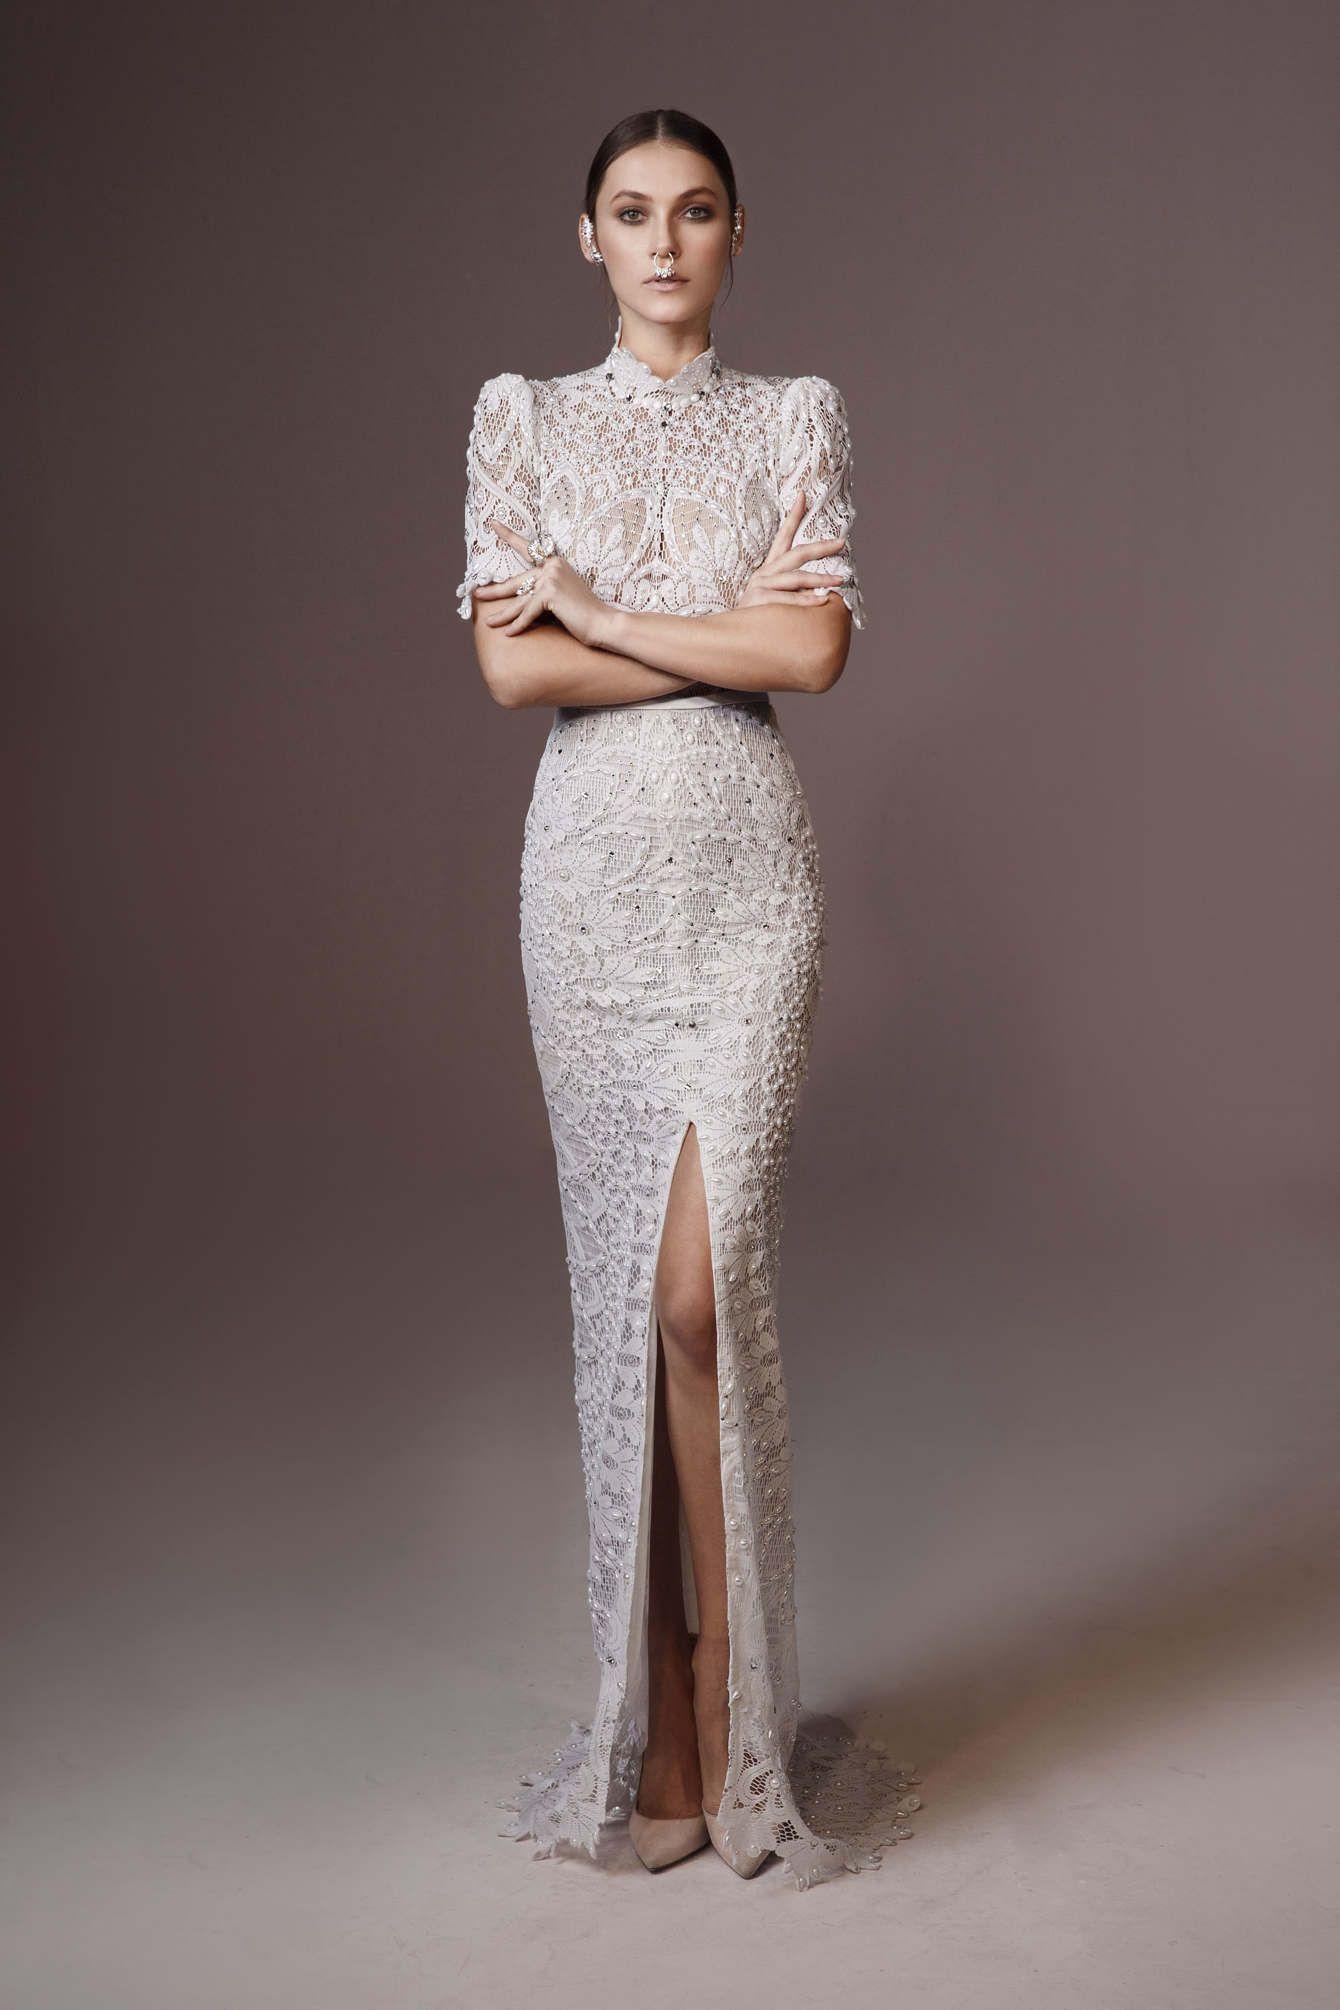 Mini white wedding dress  CHARCHY  eavning u wedding dresses  Pinterest  Wedding dress